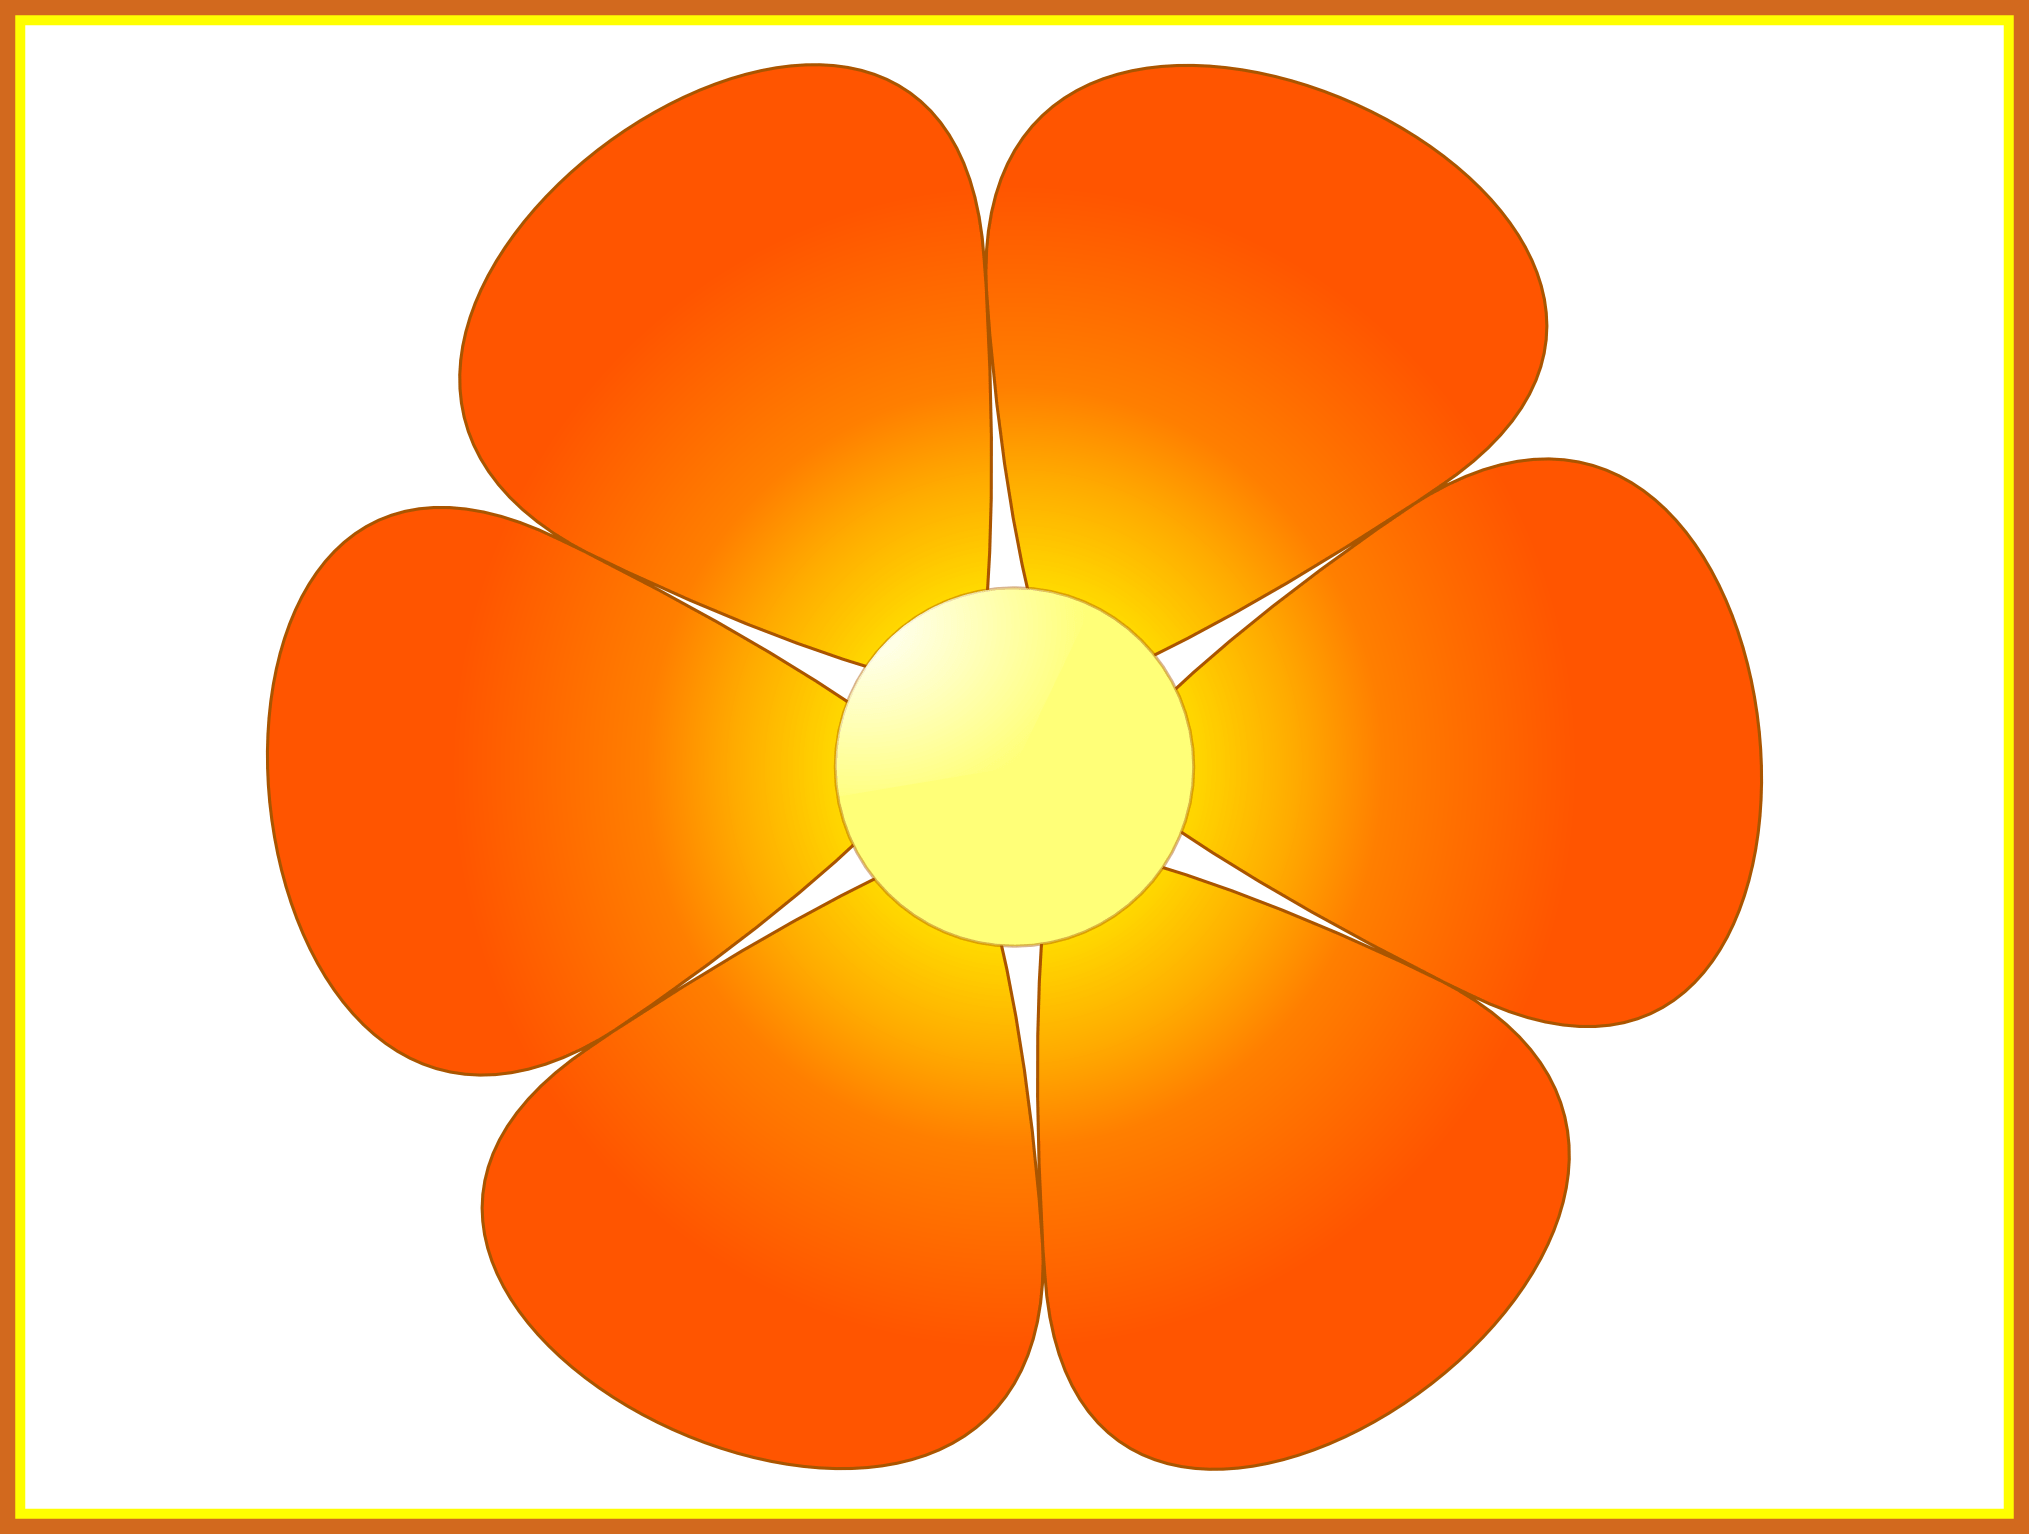 Florida clipart orange blossom. Amazing flower icons png